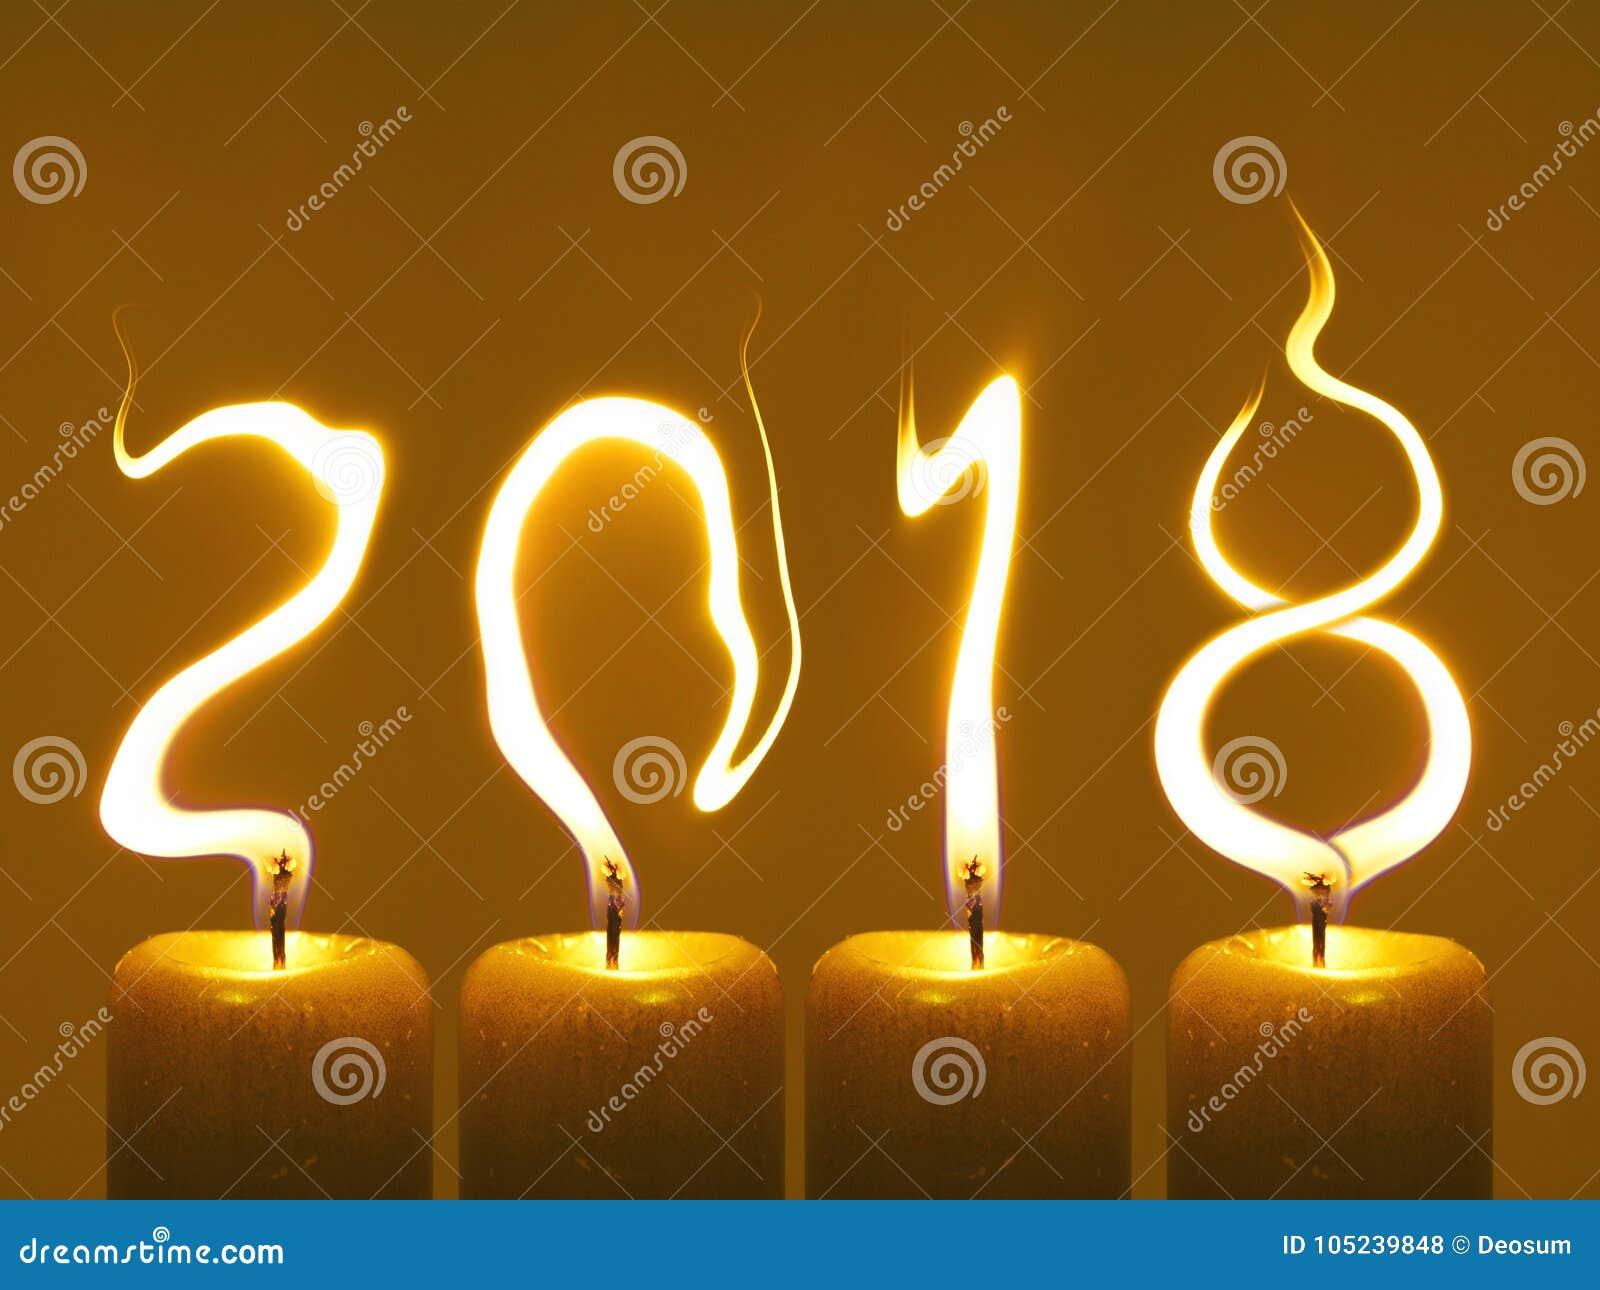 Bonne année 2018 - bougies